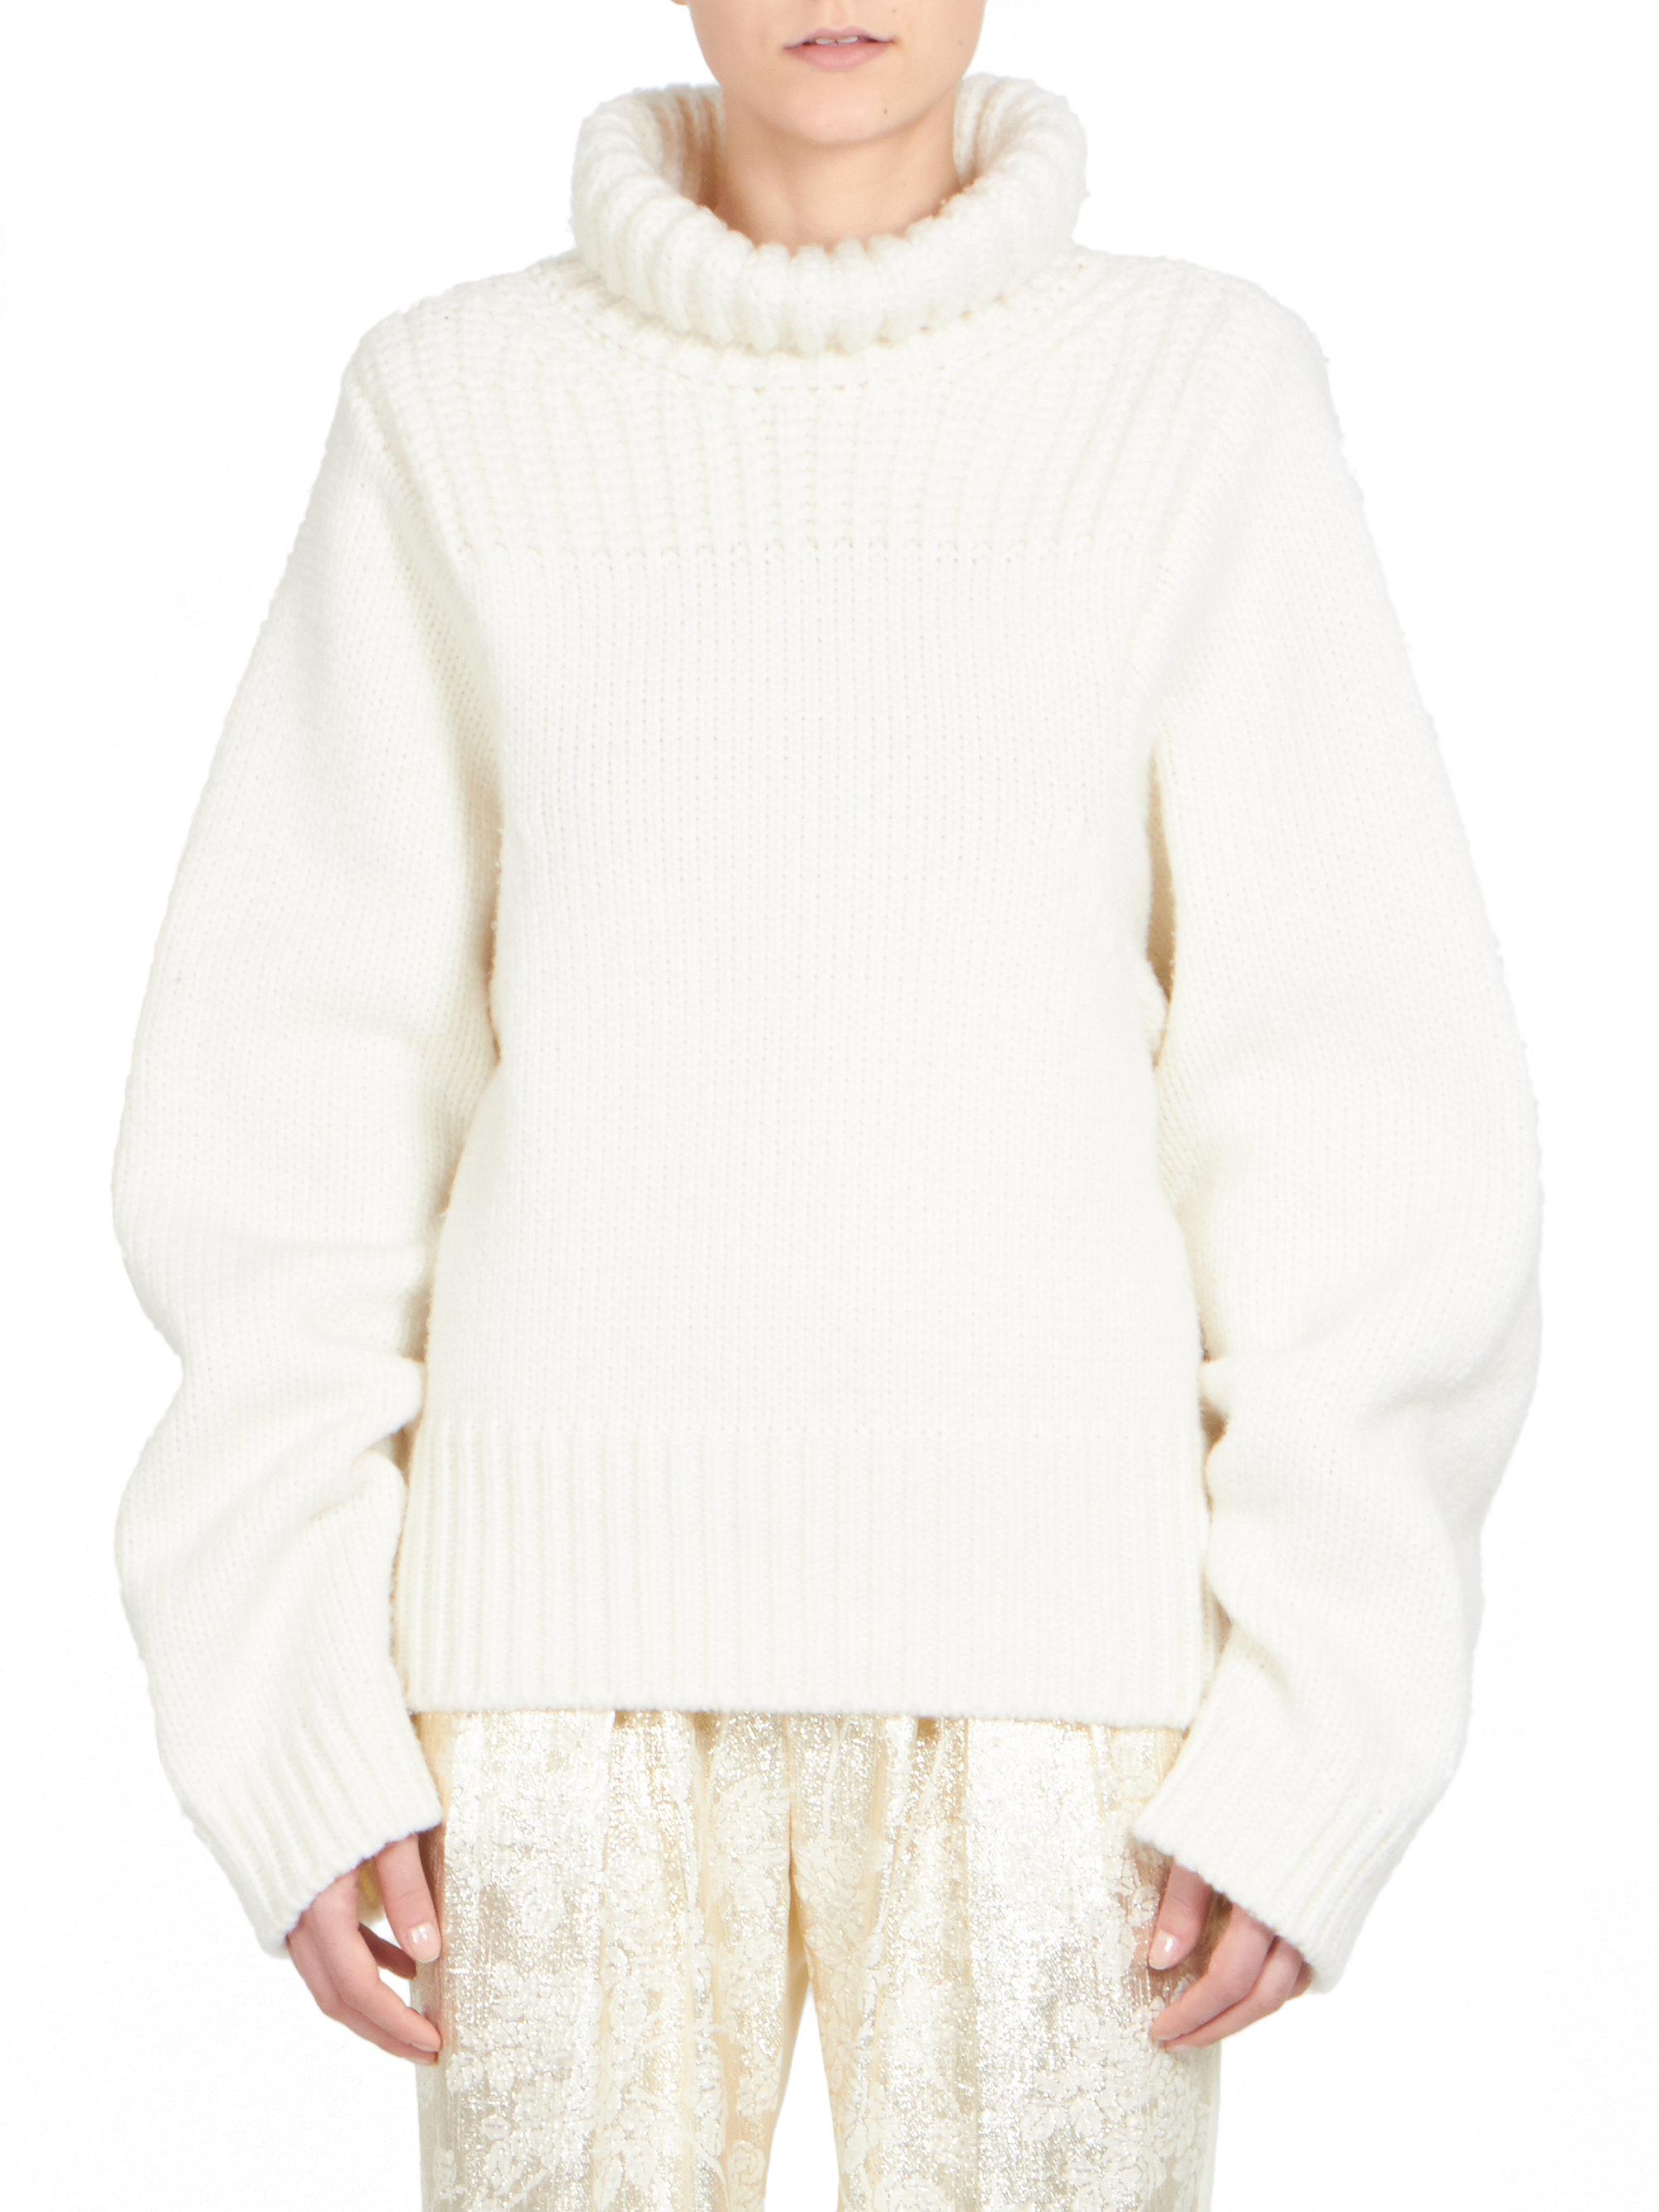 Stella mccartney Fisherman's Turtleneck Sweater in White | Lyst